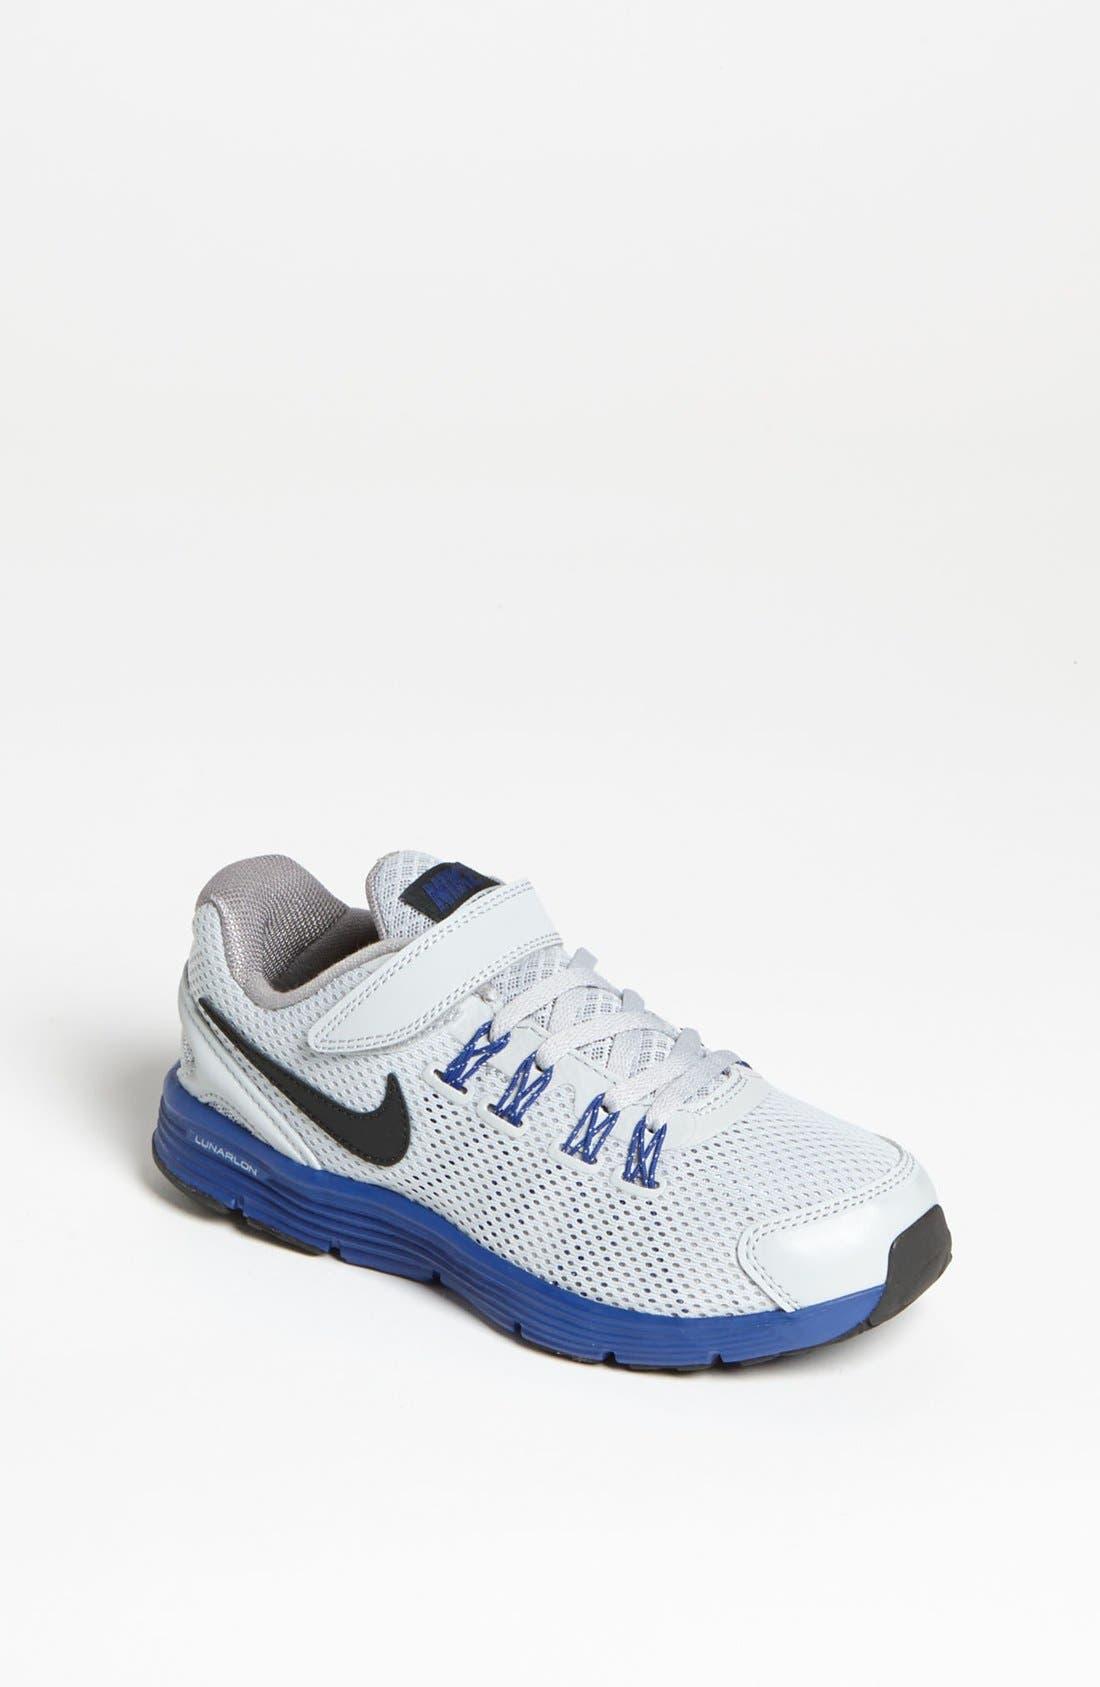 Alternate Image 1 Selected - Nike 'LunarGlide 4' Running Shoe (Baby, Walker, Toddler & Little Kid)